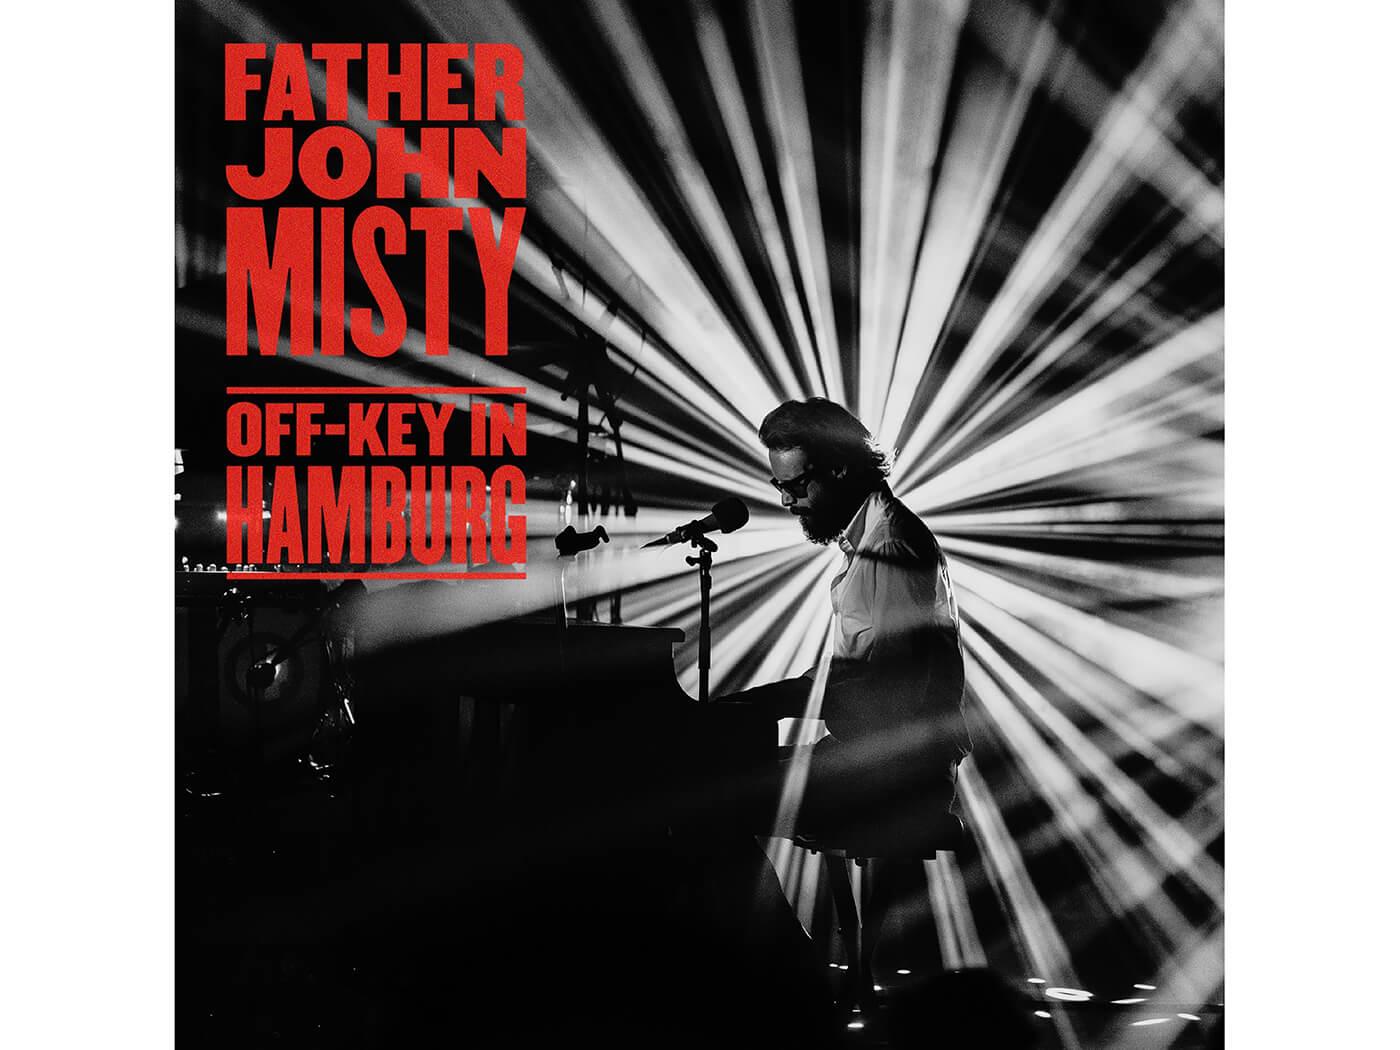 Stream Father John Misty's new live album, Off-Key In Hamburg